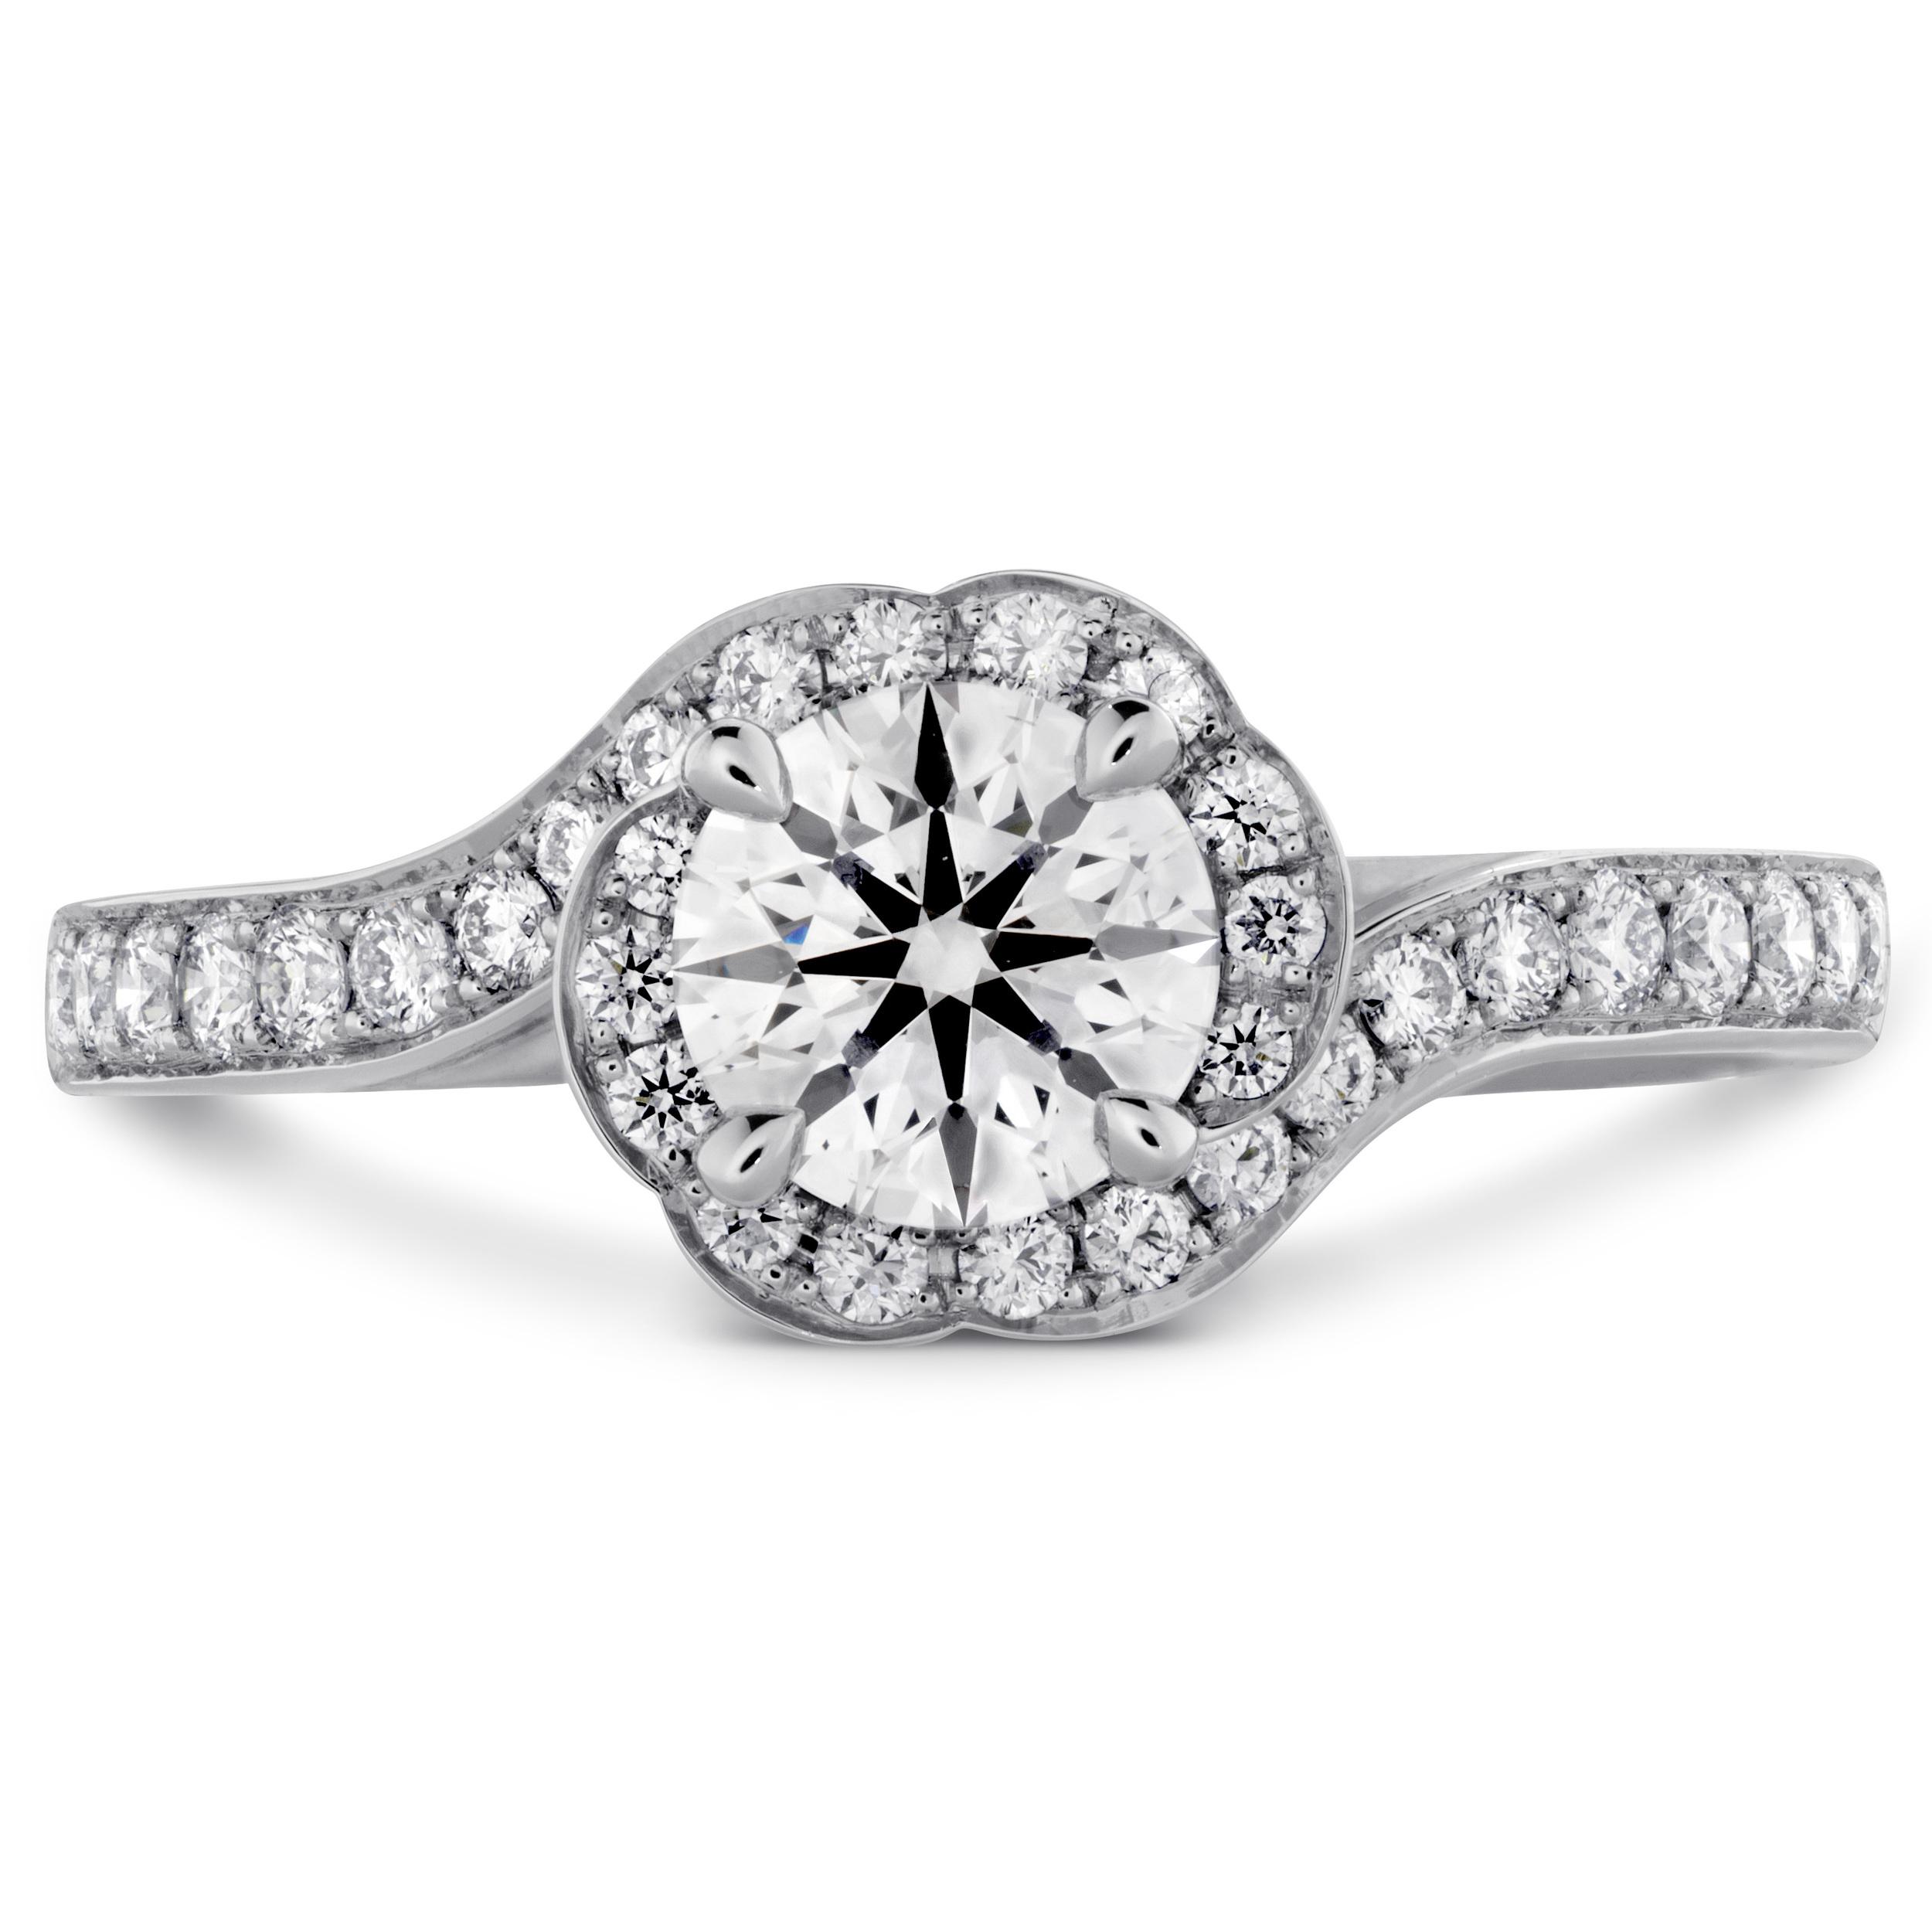 Hearts on Fire Ring   Van Gundy Jewelers   Camarillo